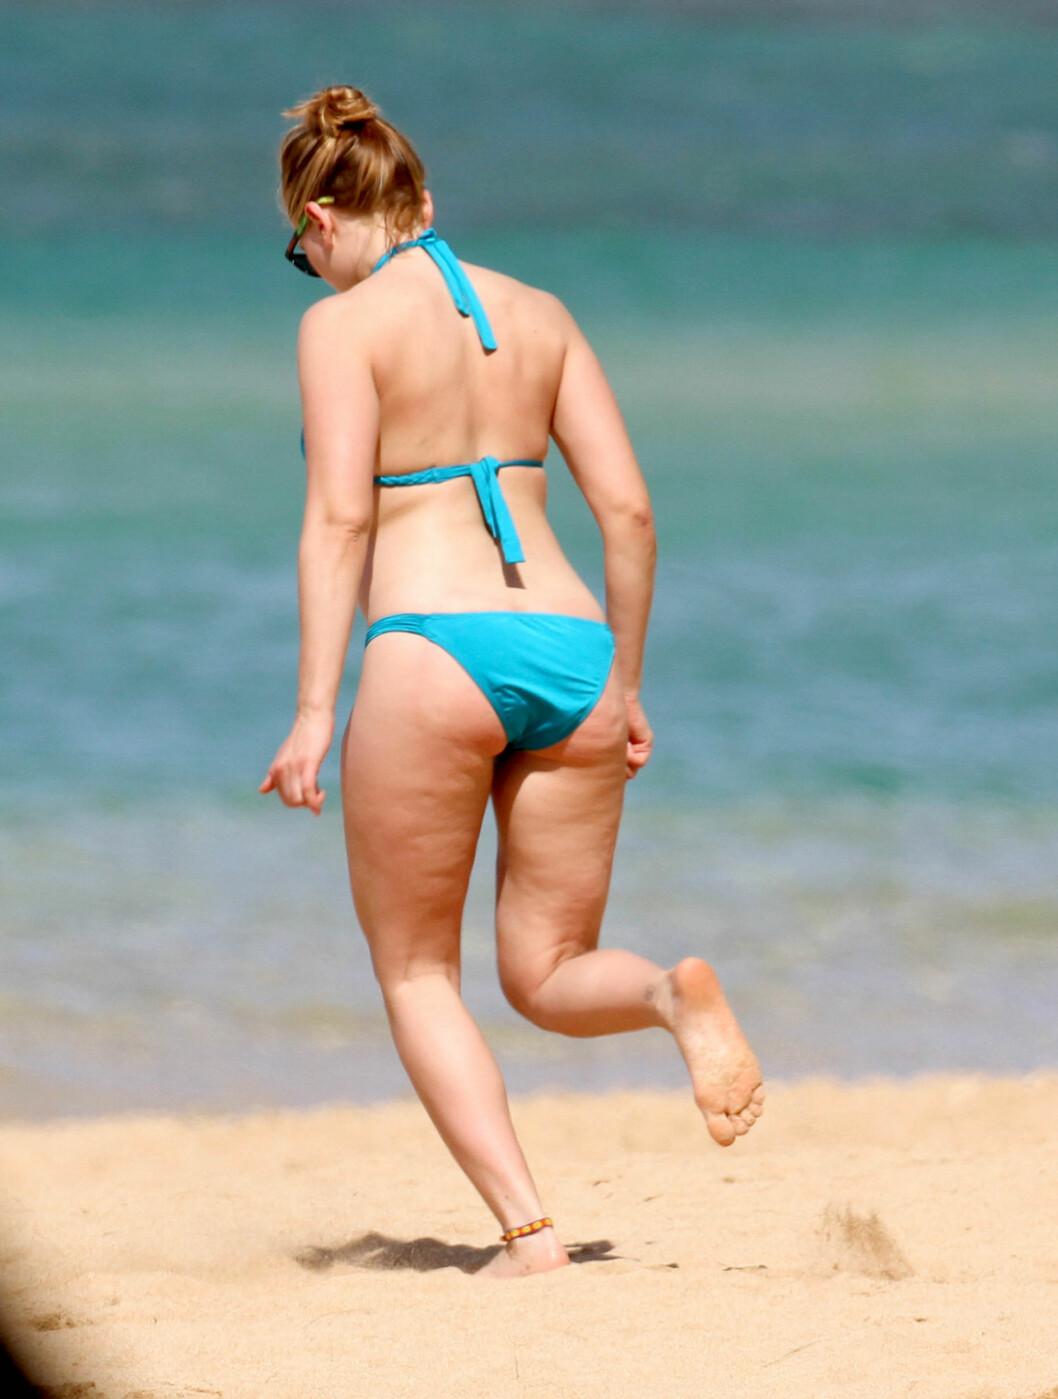 BIKINIFORM: Scarlett hadde valgt en turkis bikini for anledningen. Foto: All Over Press